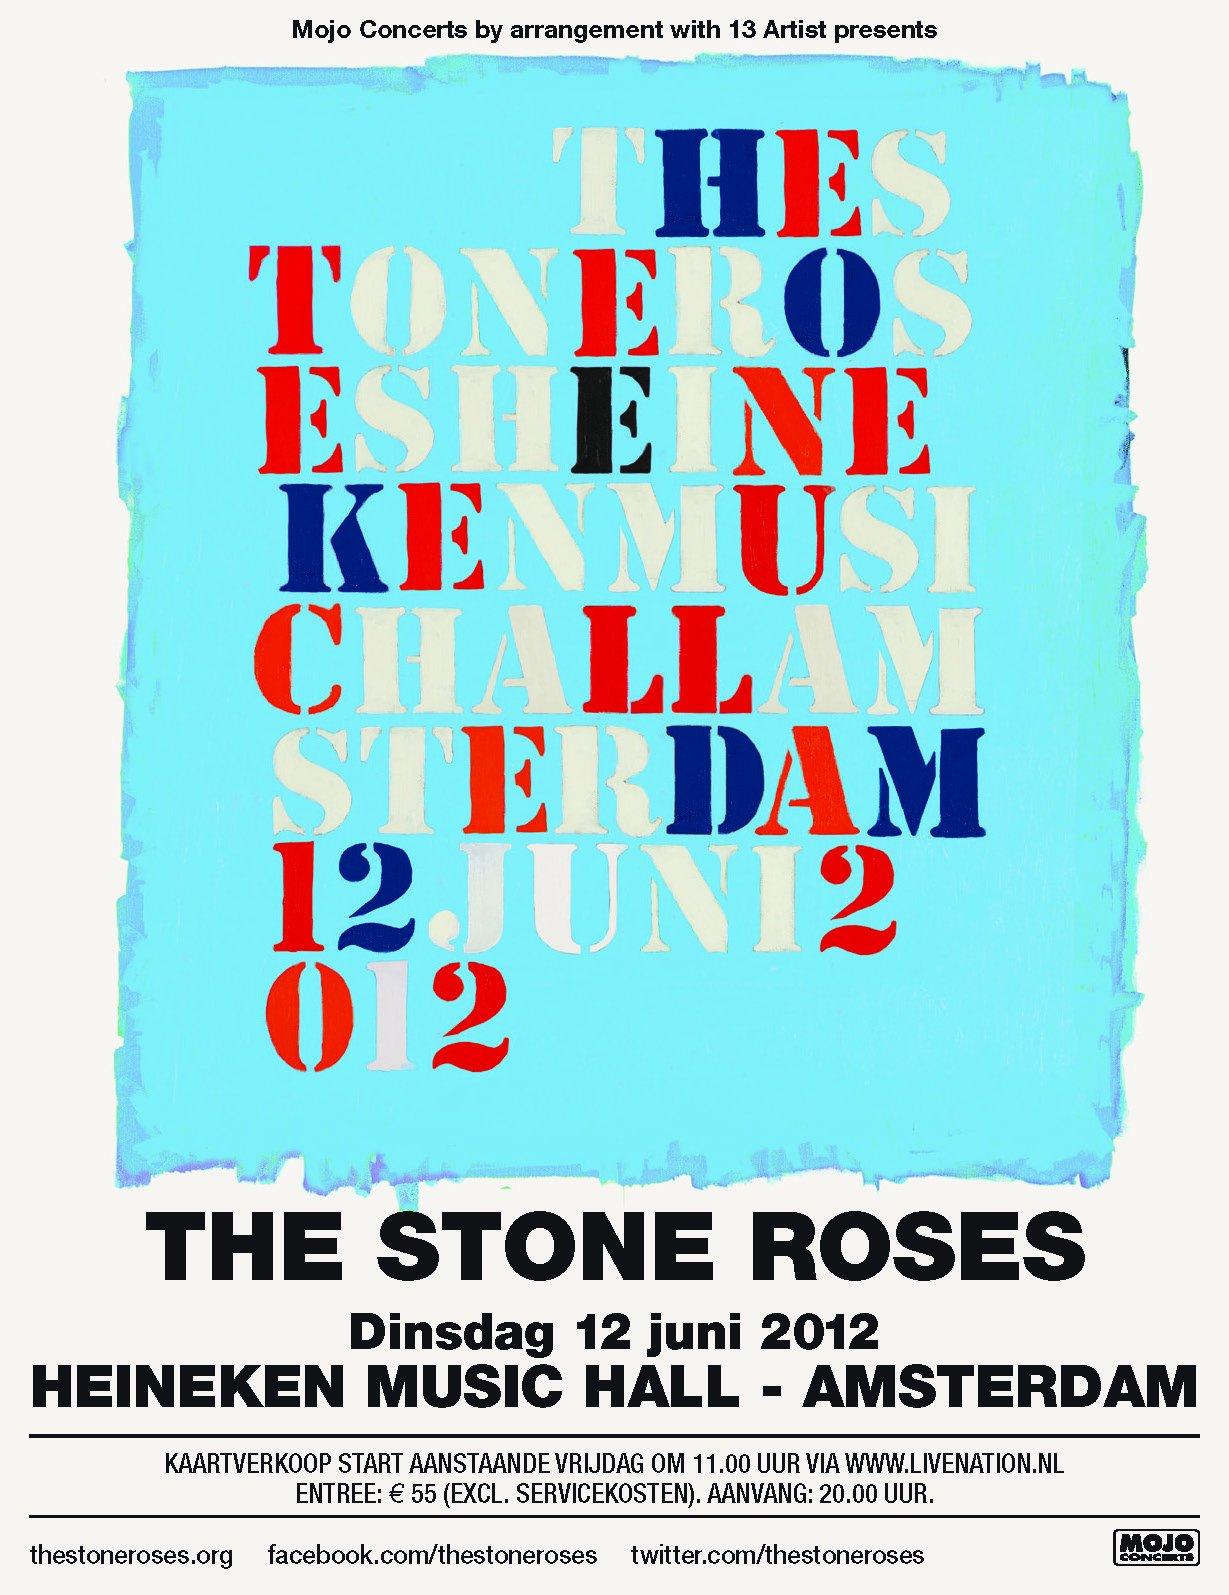 music hall amsterdam